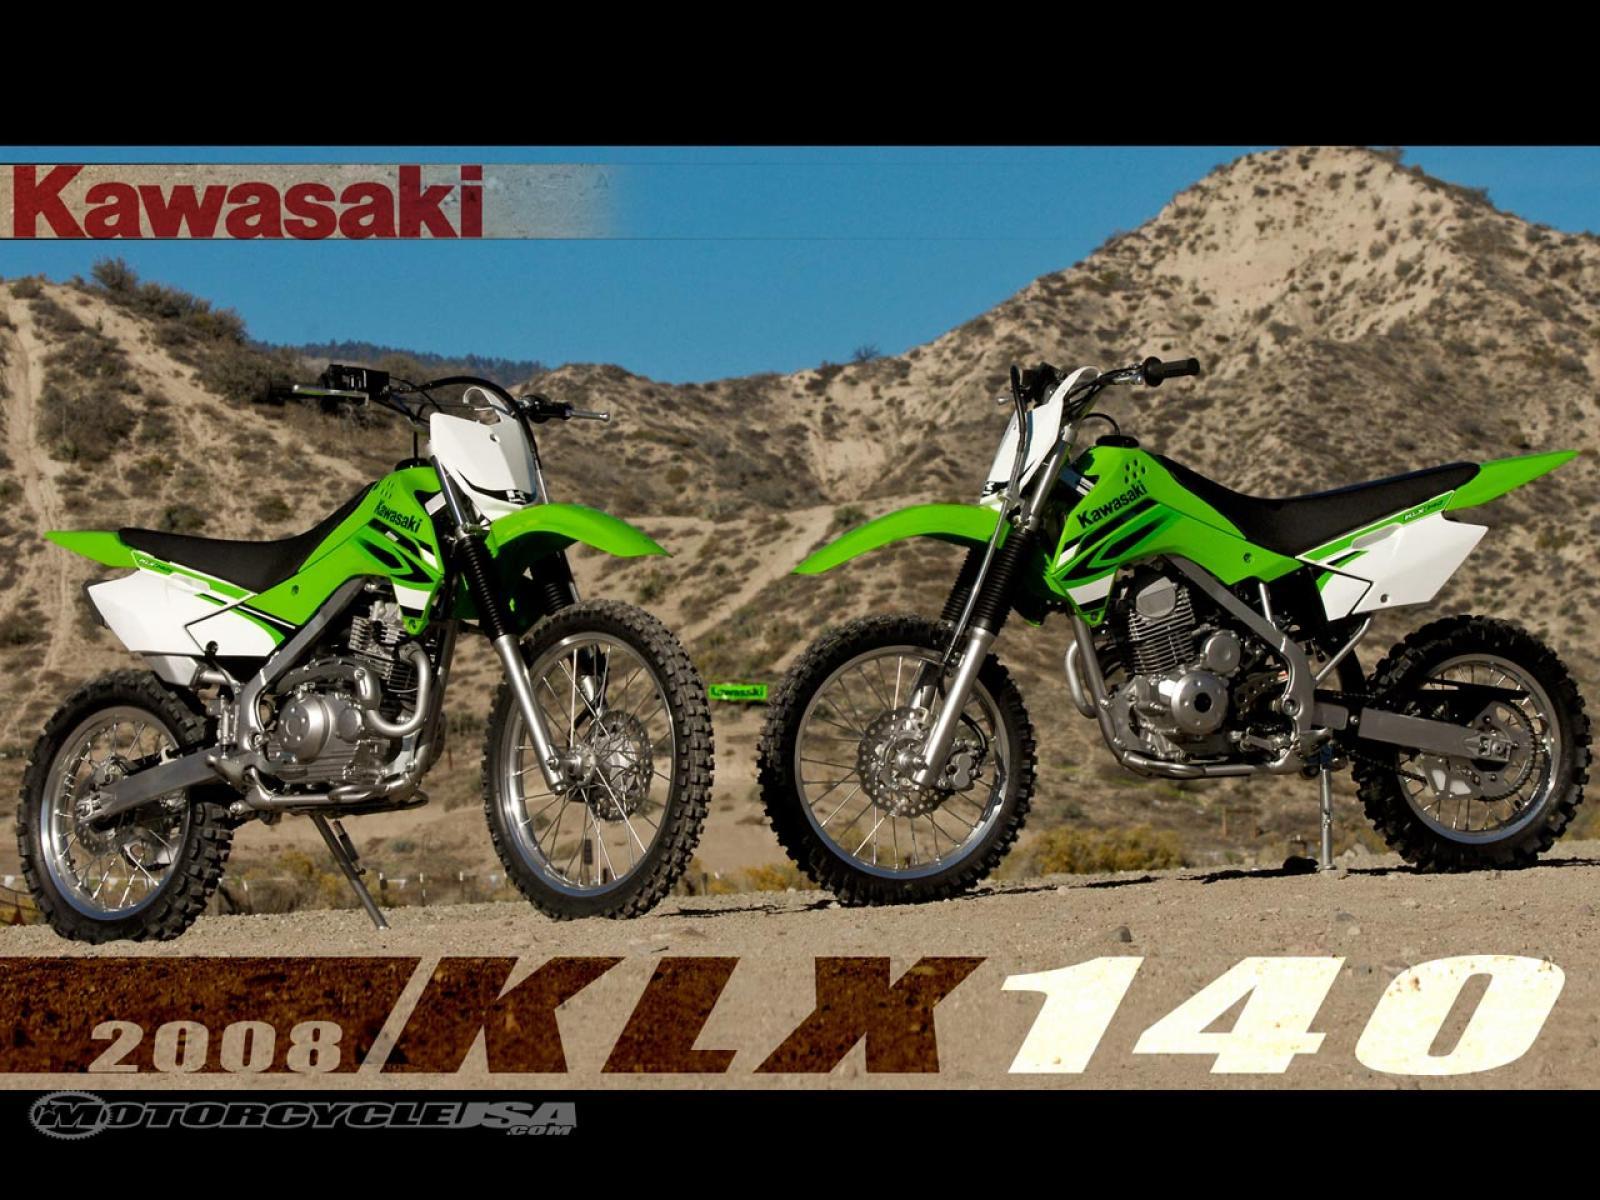 hight resolution of 800 1024 1280 1600 origin kawasaki